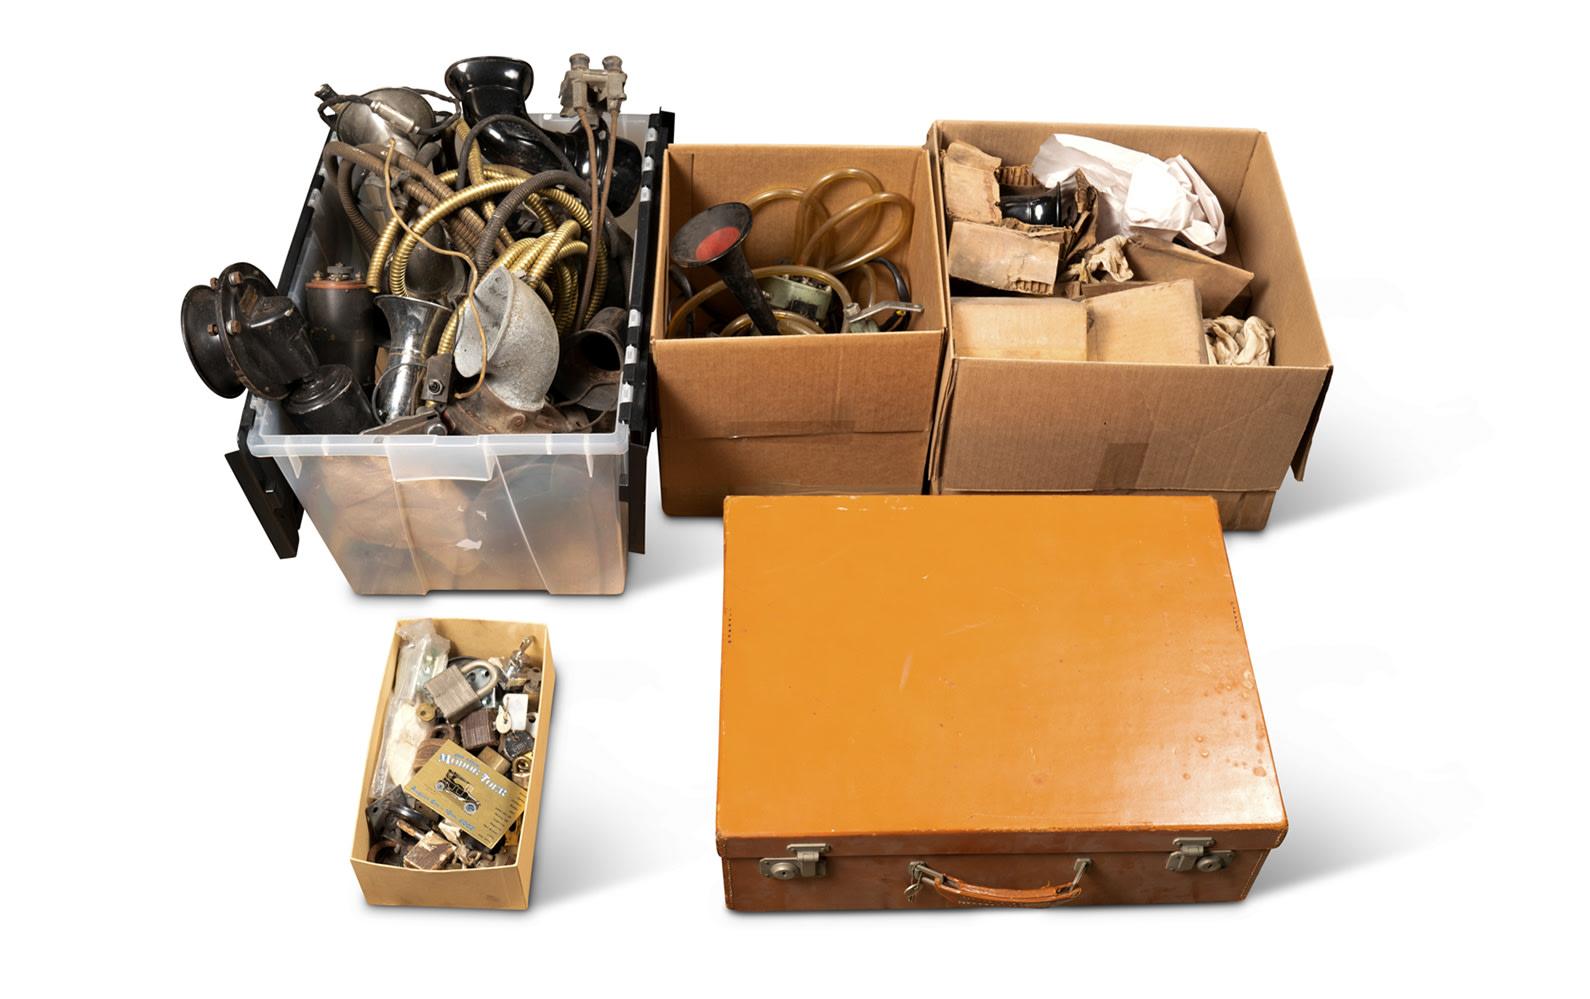 Horns, Radios, Assorted Padlocks, and Men's Grooming Case